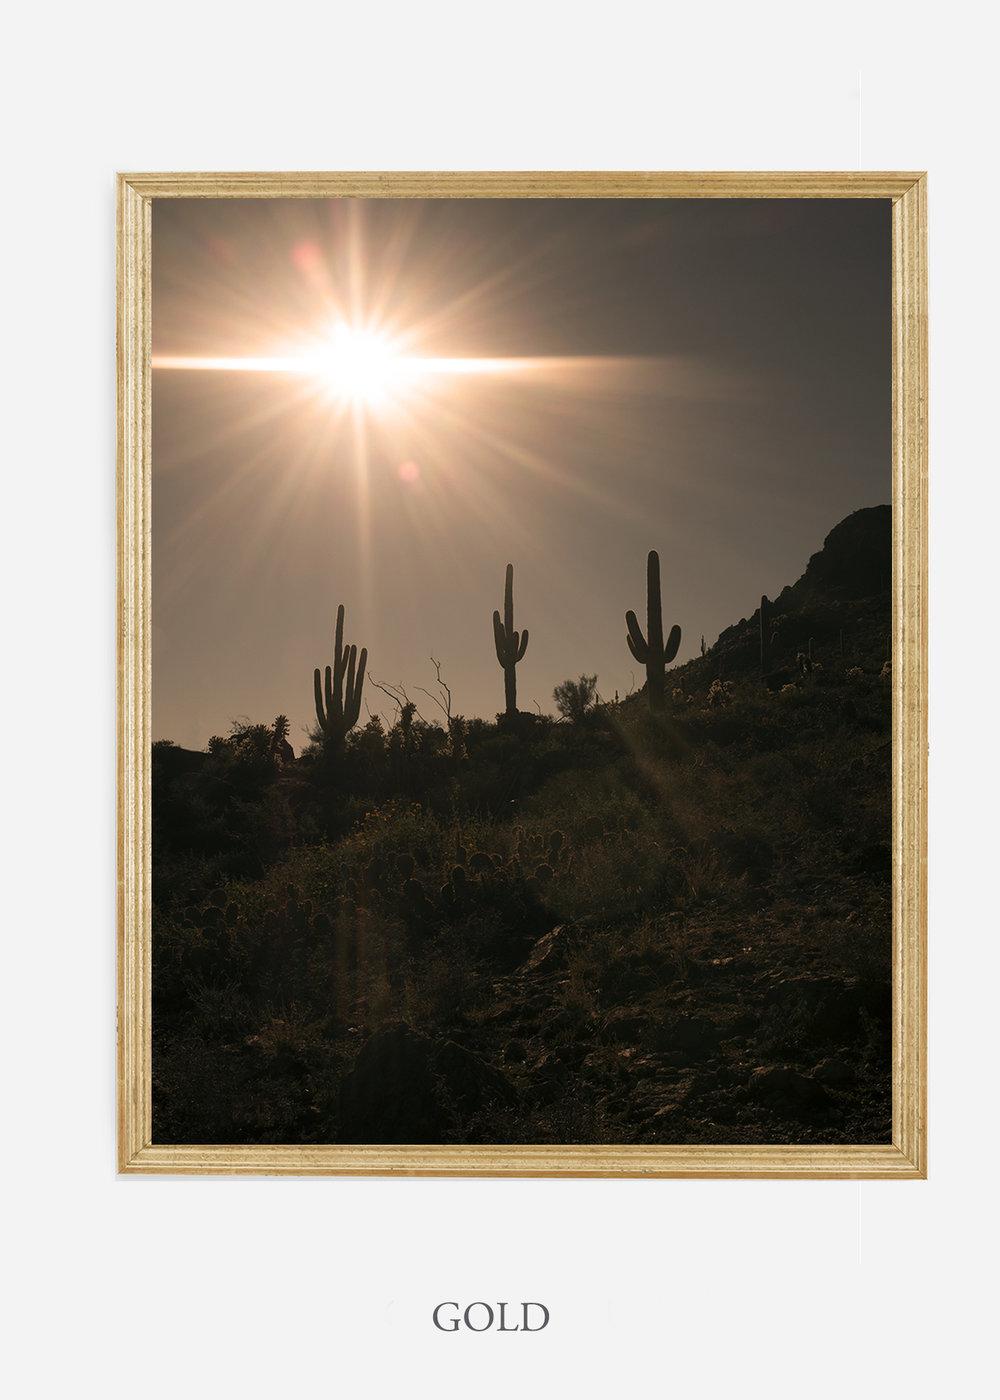 nomat-goldframe-saguaroNo.16-wildercalifornia-art-wallart-cactusprint-homedecor-prints-arizona-botanical-artwork-interiordesign.jpg